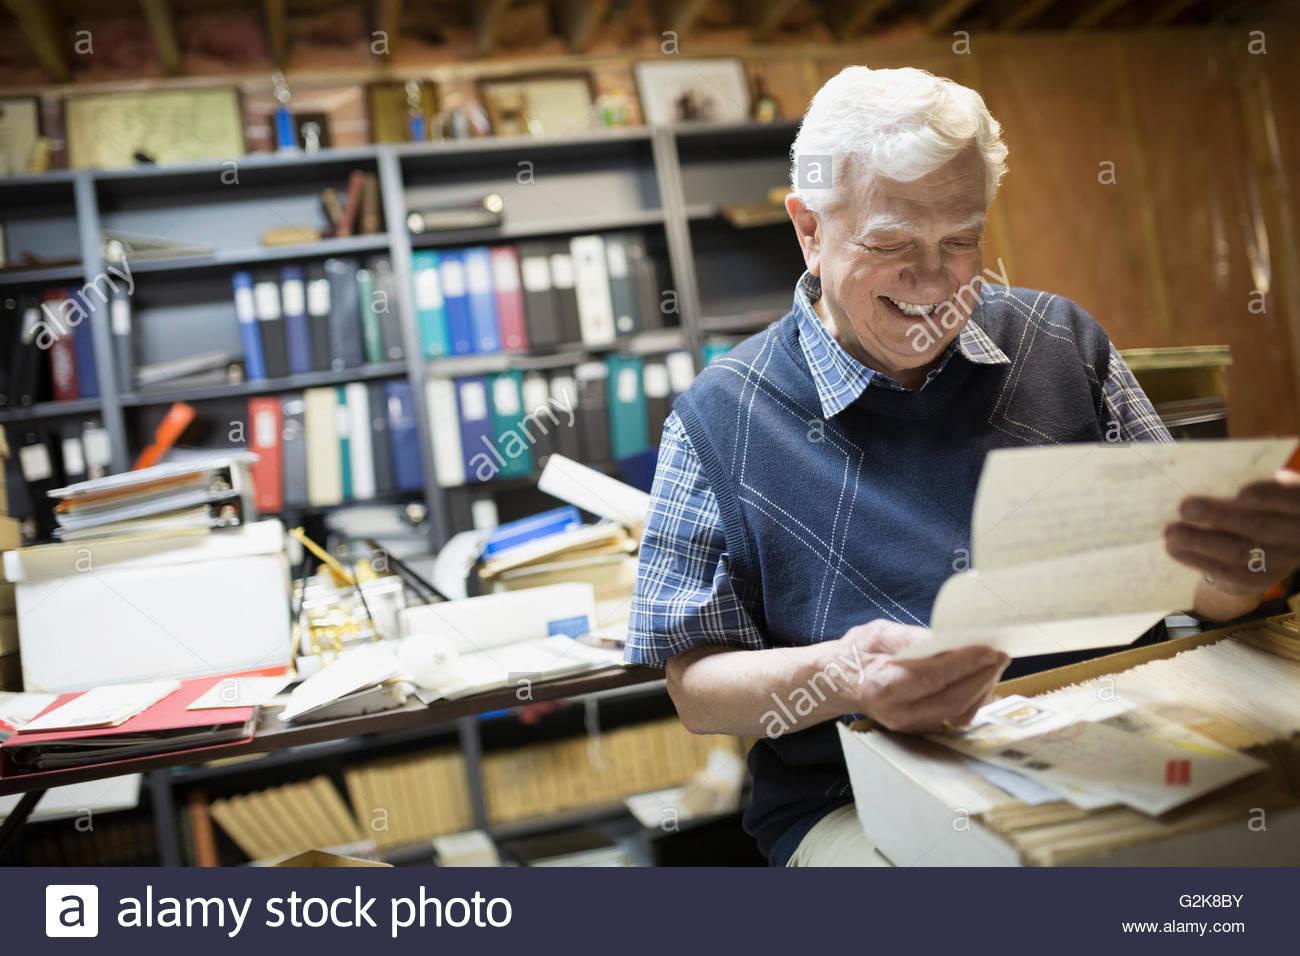 Smiling senior man reading old letters - Stock Image